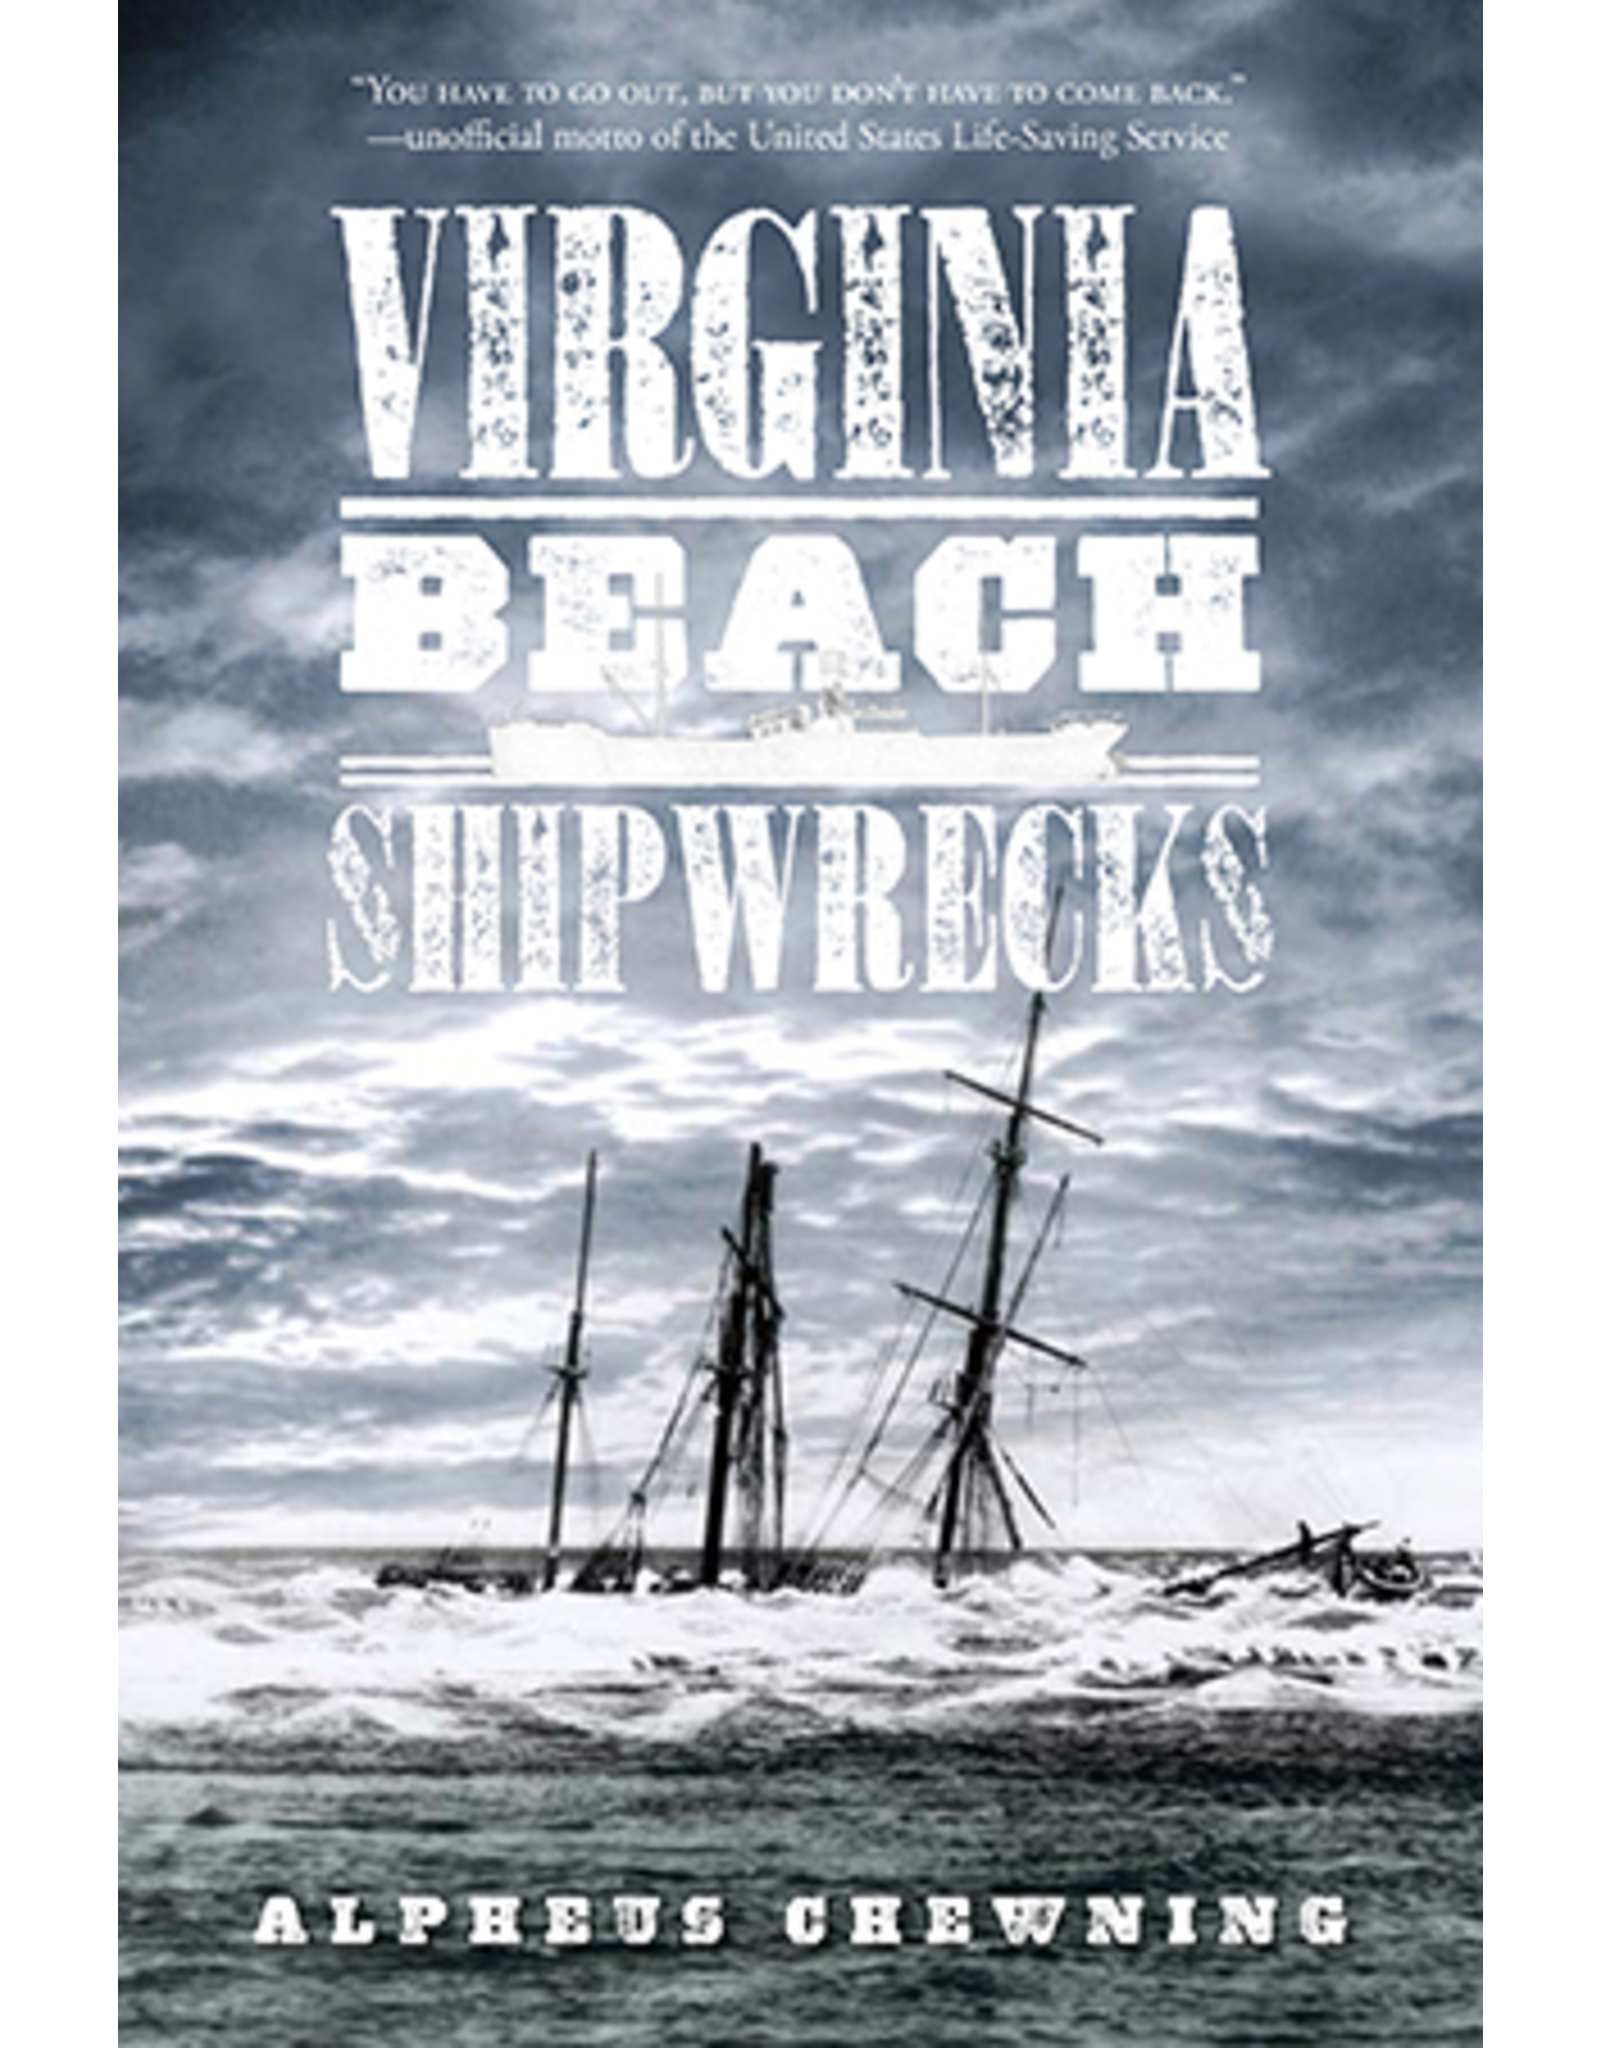 Virginia Beach Shipwrecks